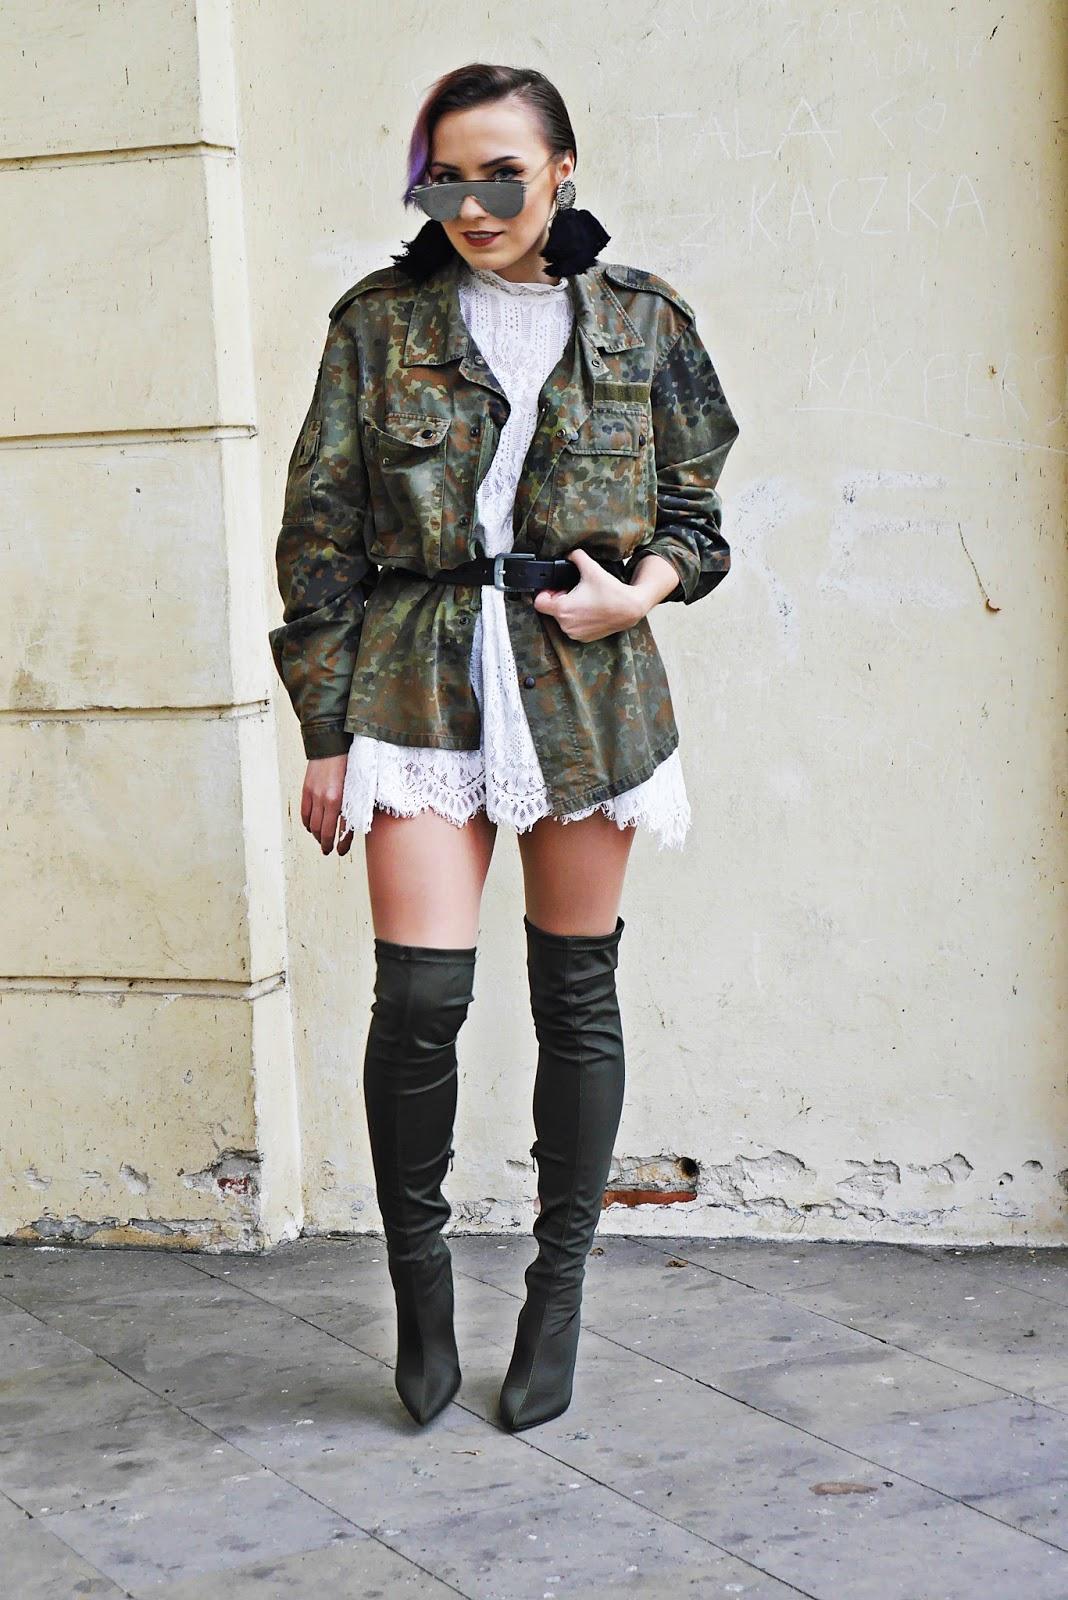 6_moro_kurtka_sh_koronkowa_biala_sukienka_karyn_blog_buty_renee_031217gt